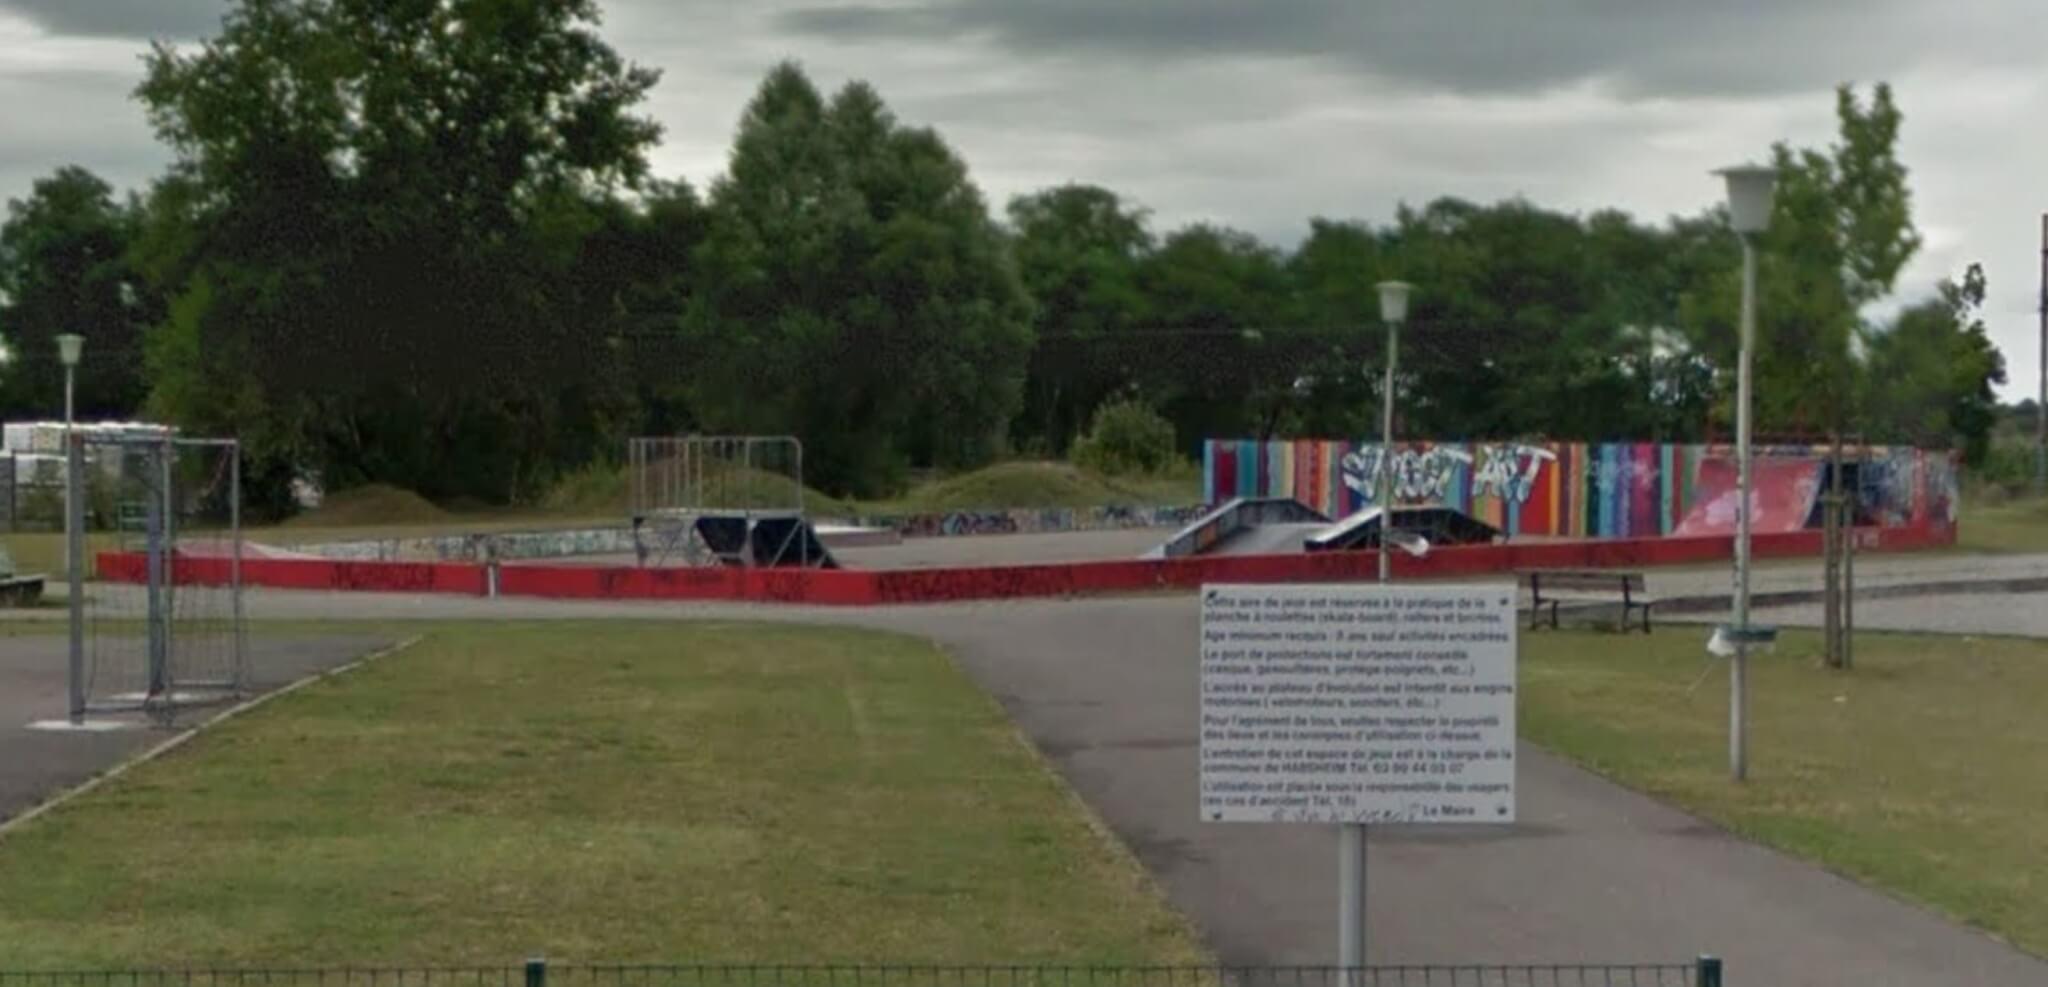 Habsheim – Skate park